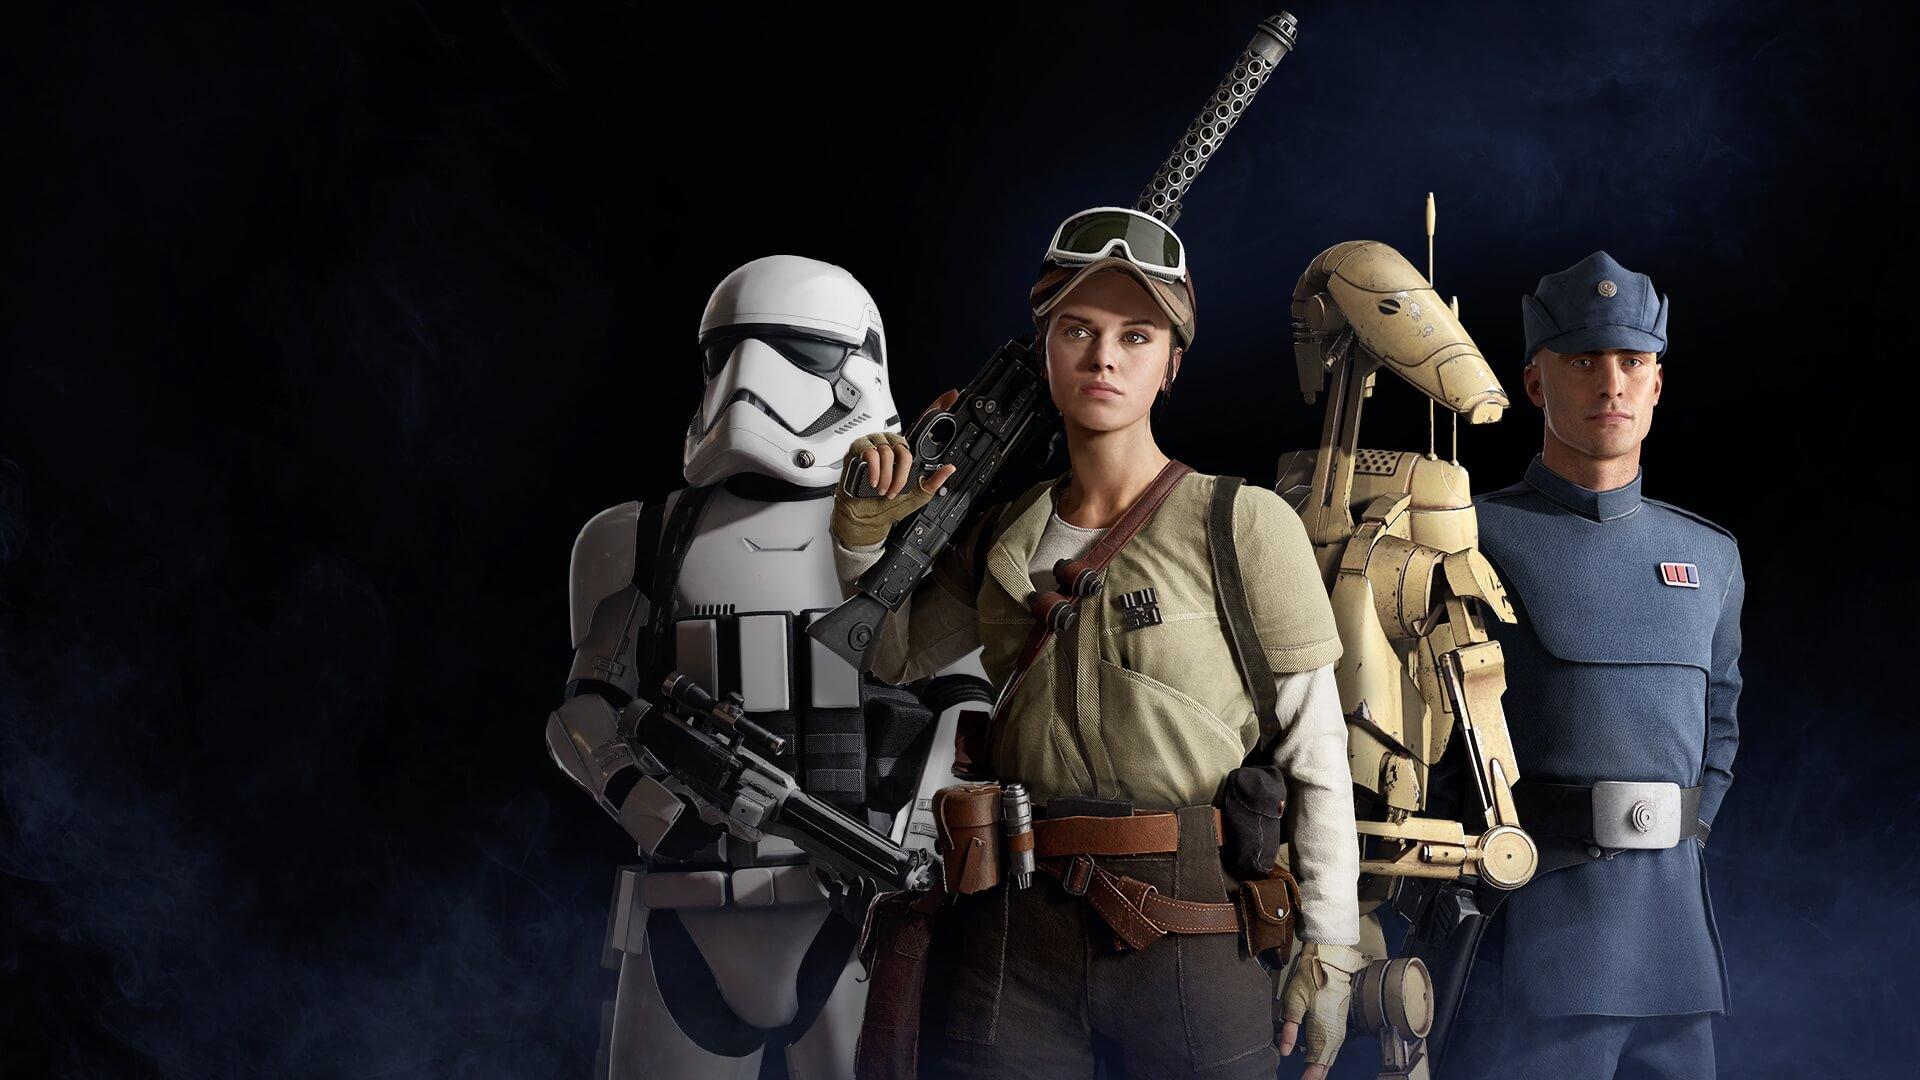 Wallpaper Star Wars Battlefront Ii Star Wars 1920x1080